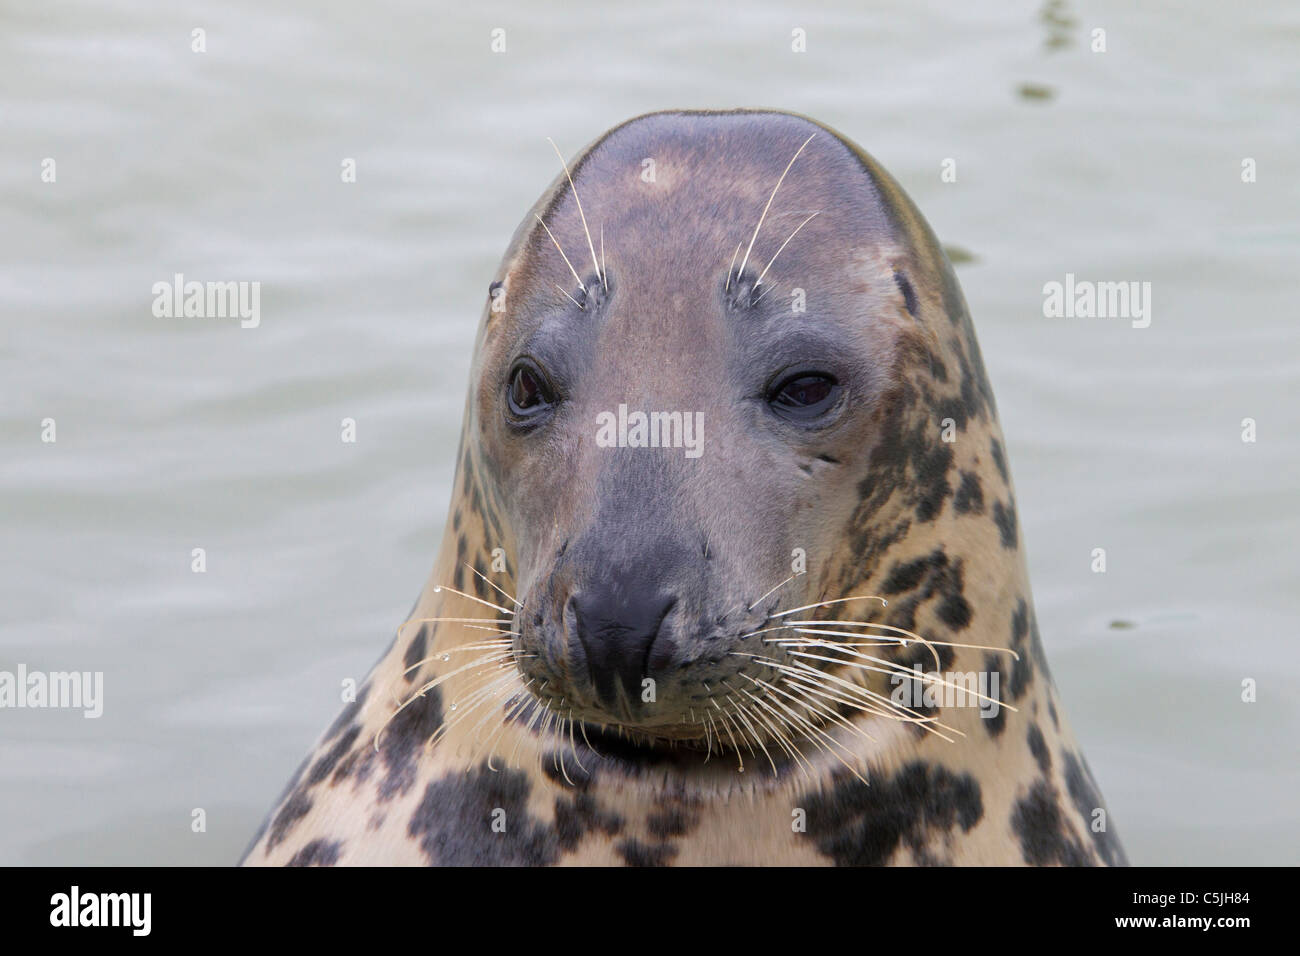 Grey seal / Gray seal (Halichoerus grypus) swimming, Waddensea, Germany Stock Photo